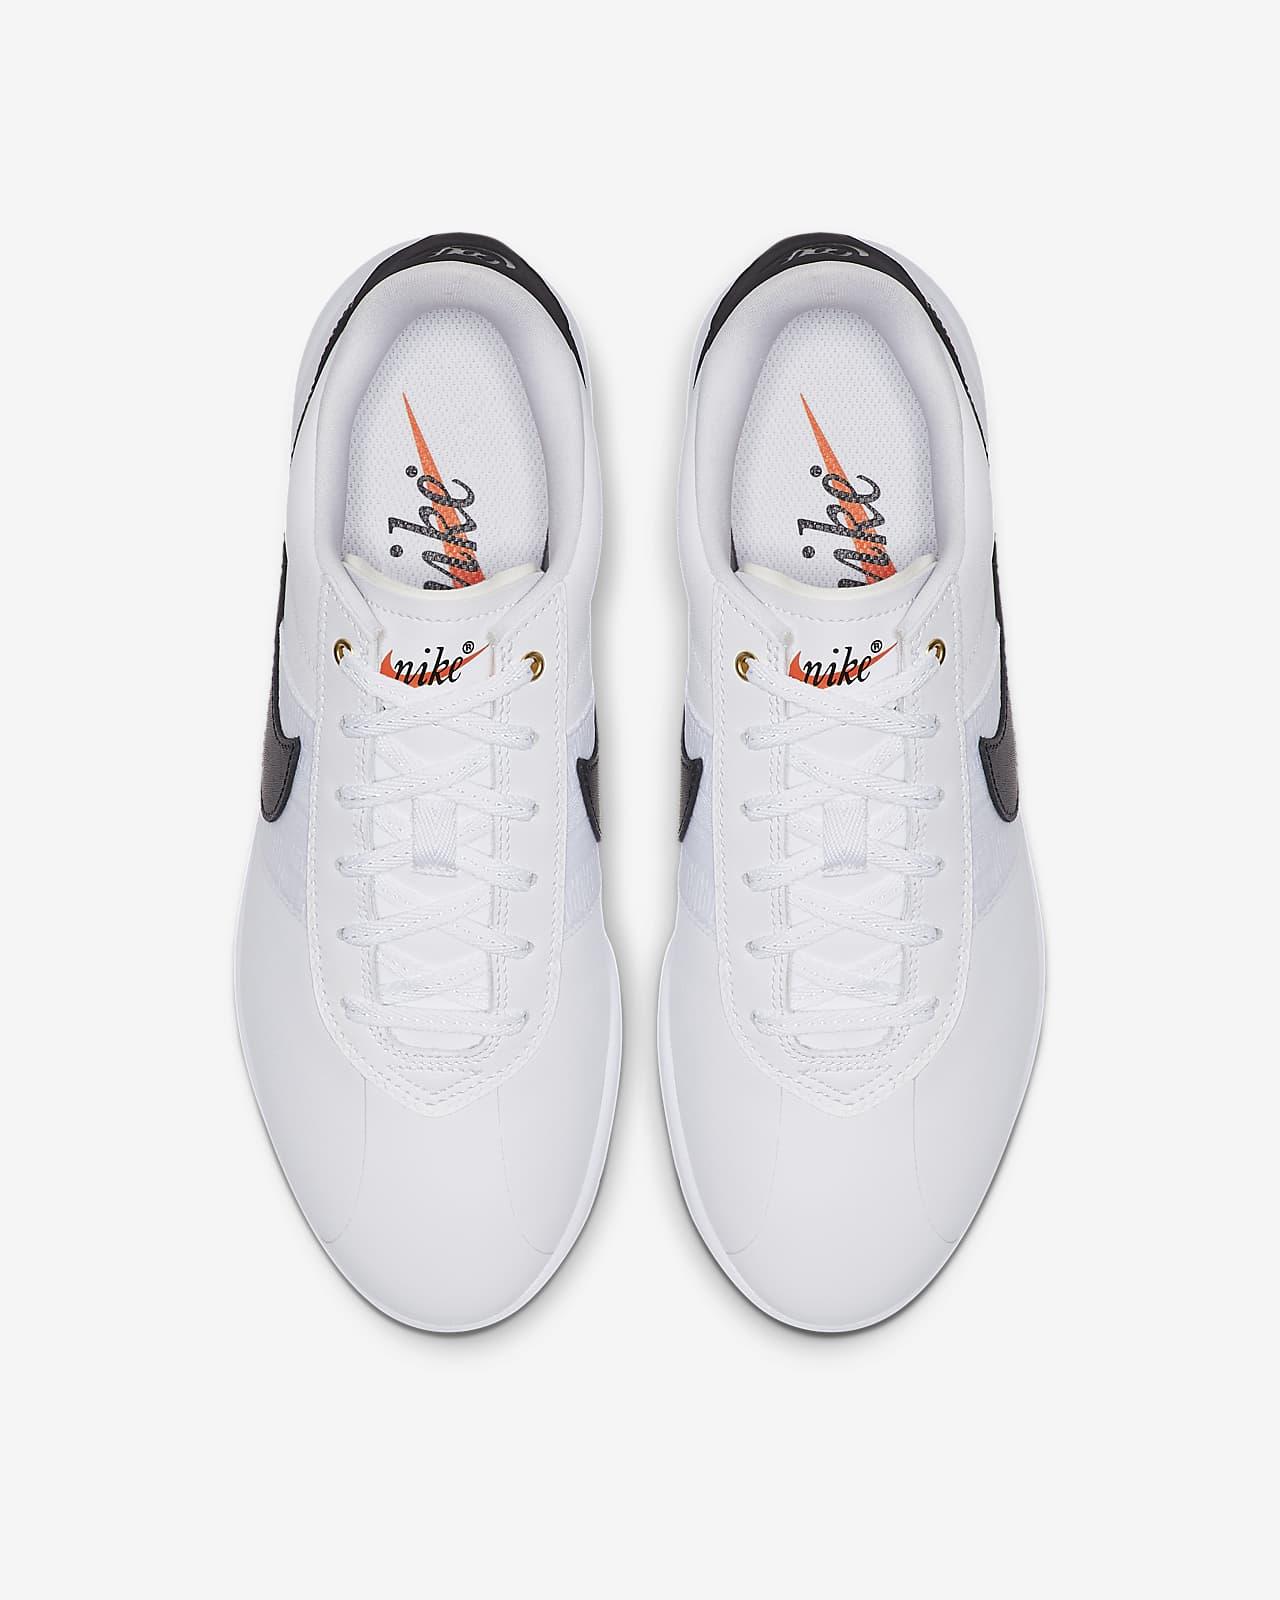 enfermedad bádminton voluntario  Nike Cortez G Women's Golf Shoe. Nike SA